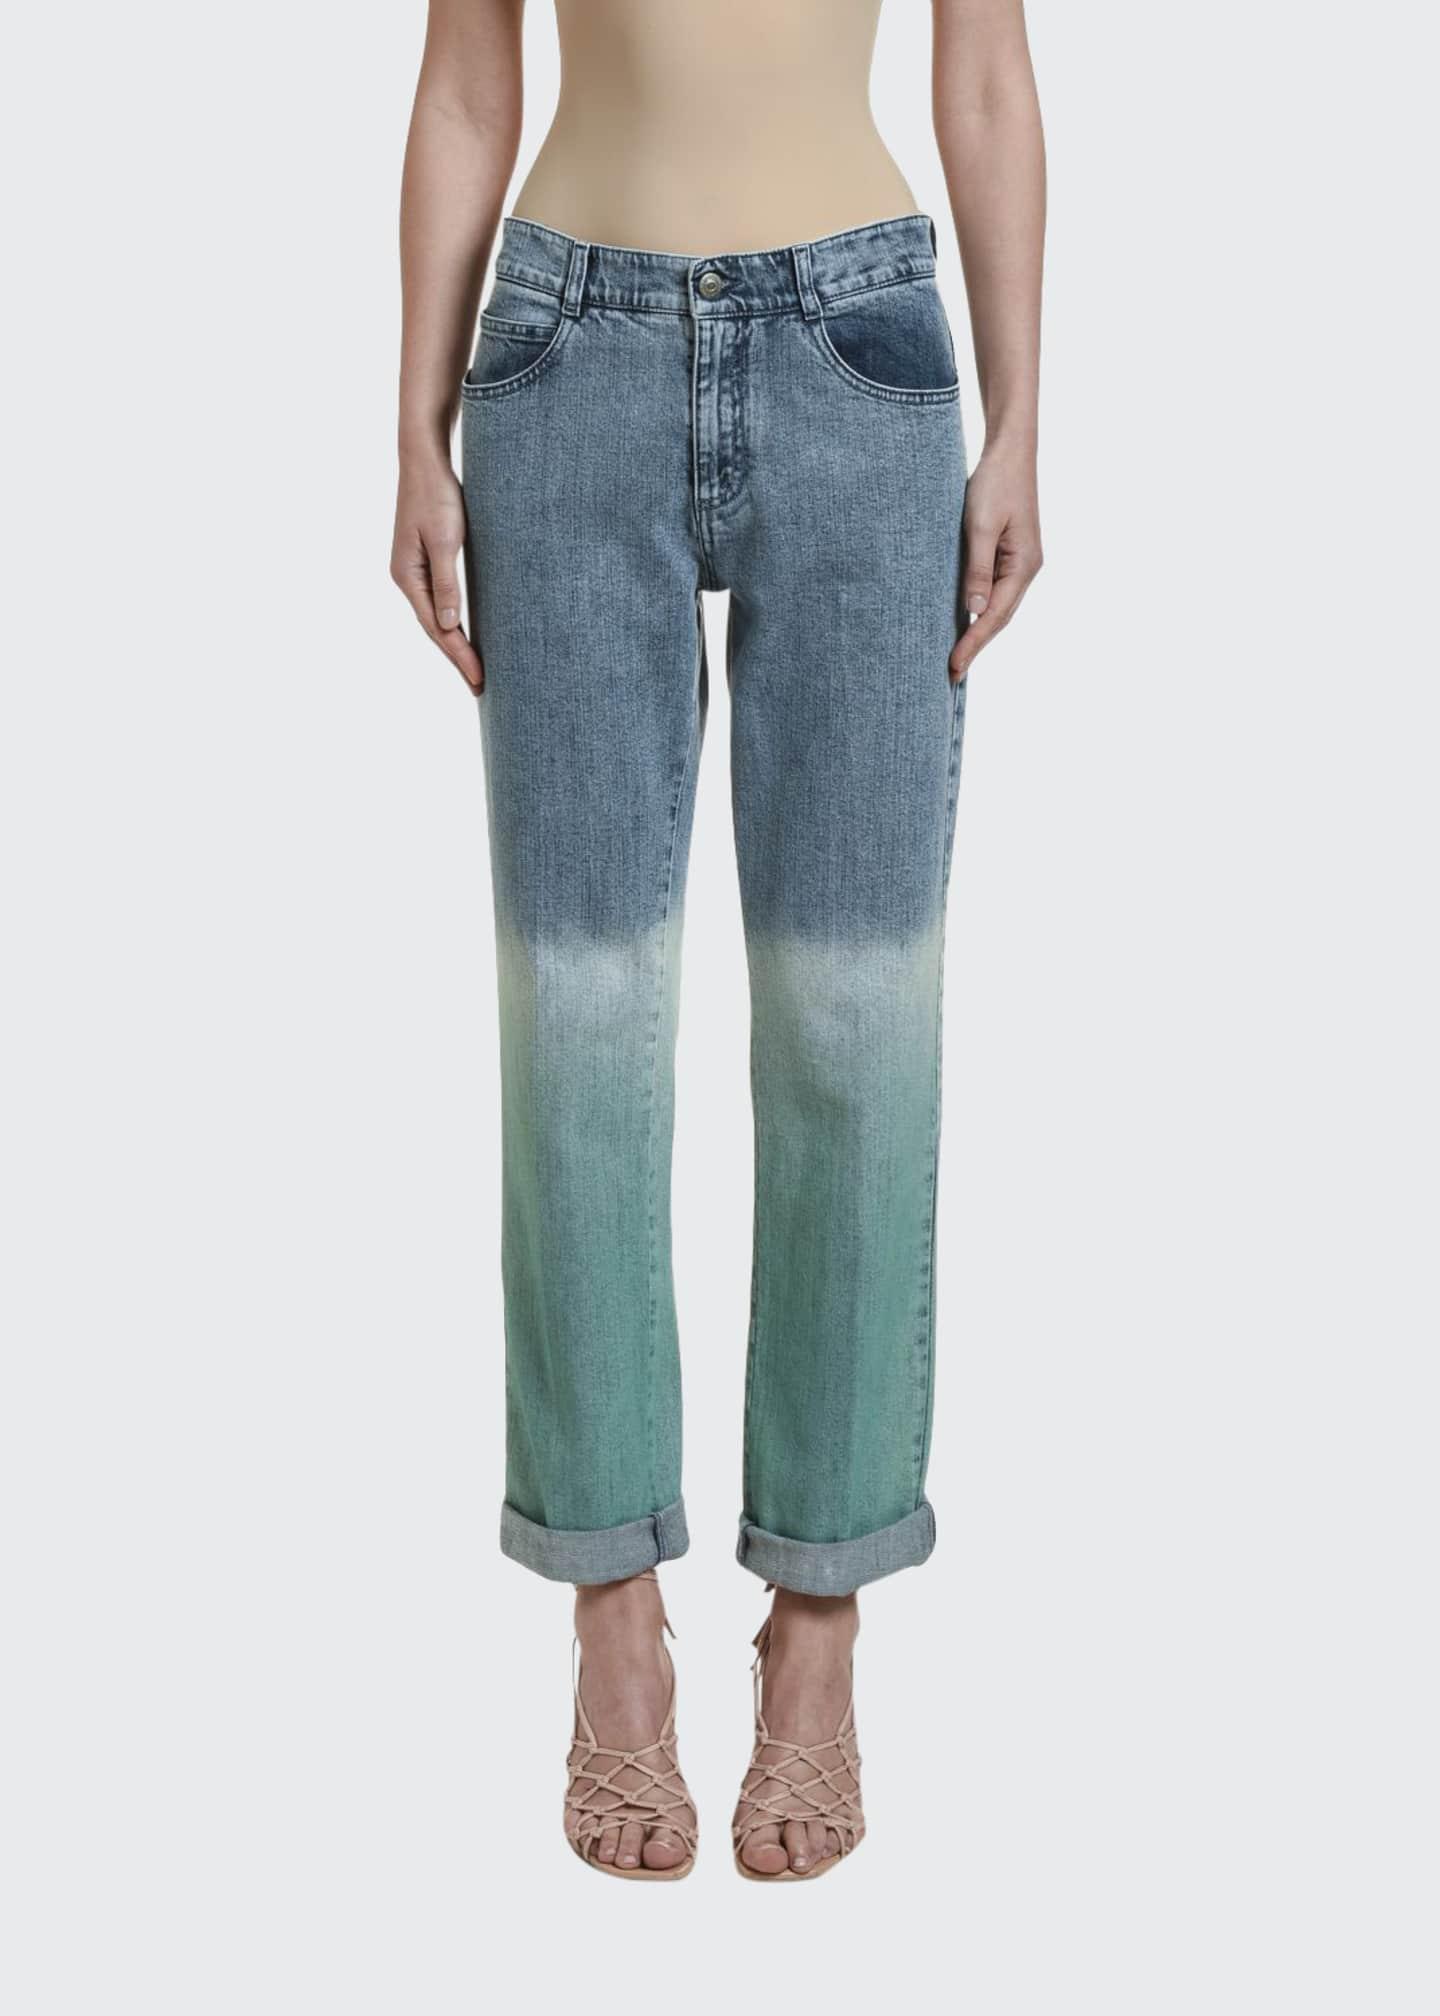 Stella McCartney Degrade Slim-Fit Jeans